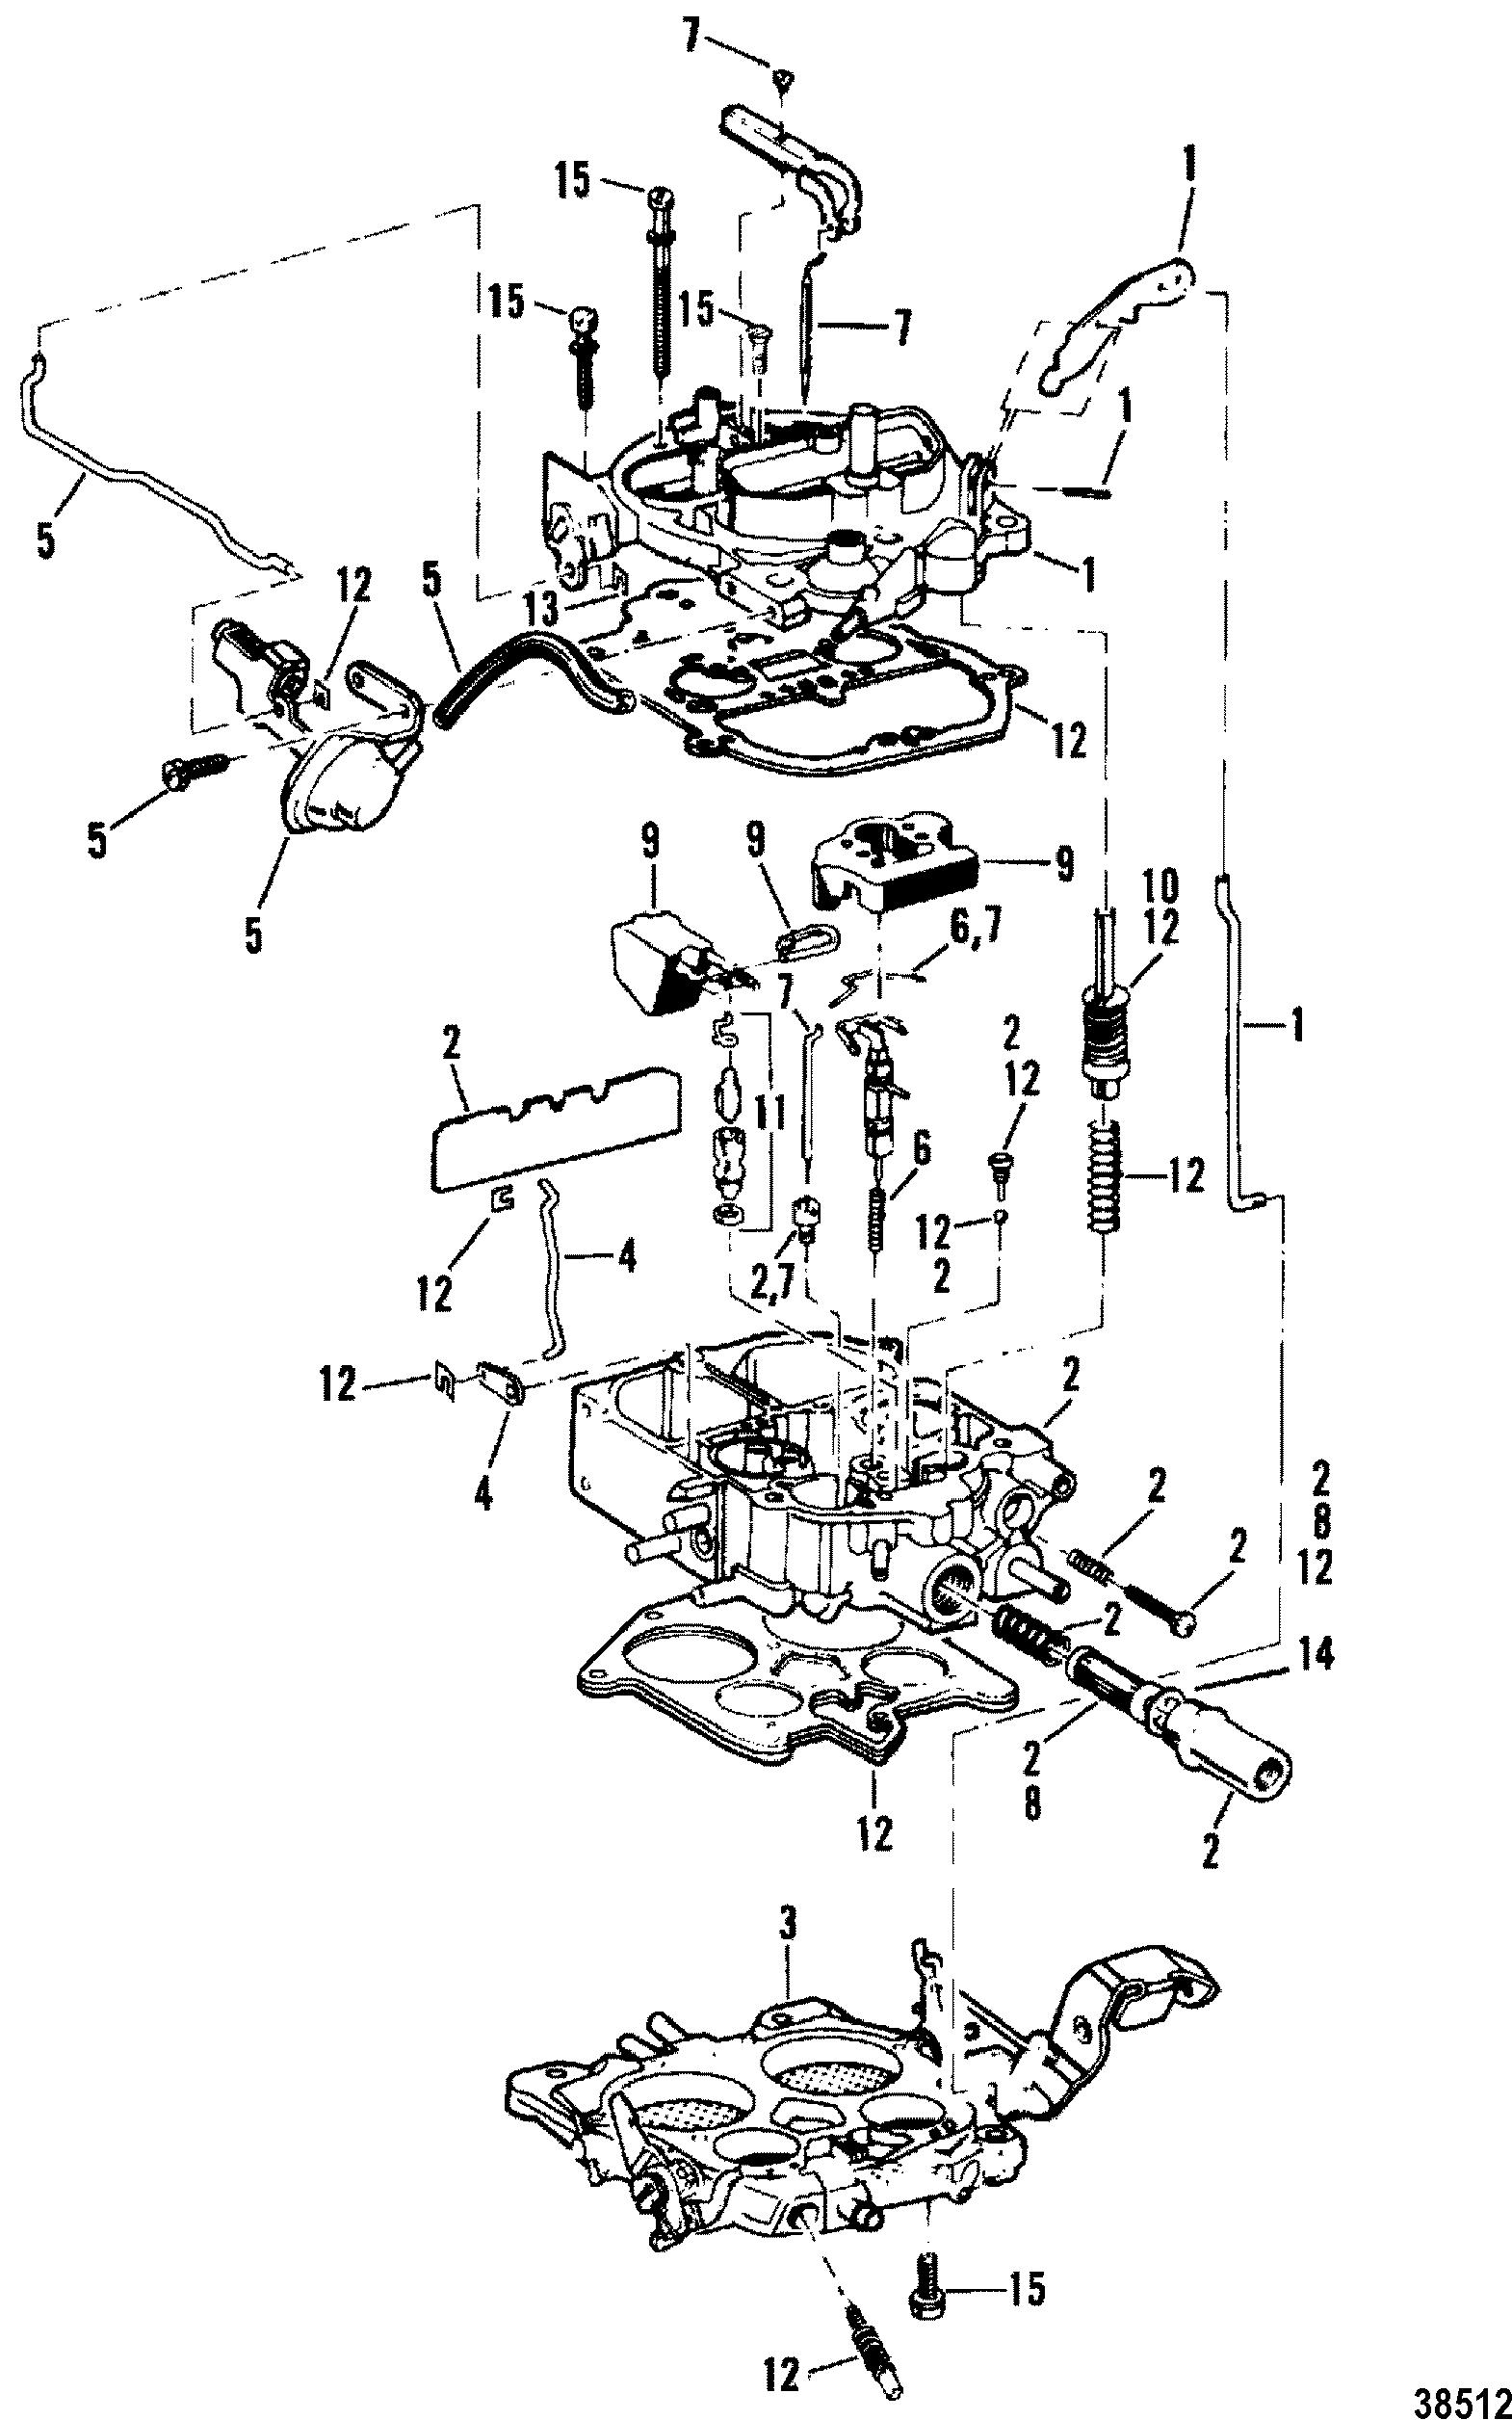 rochester 4 barrel carburetor diagram micro usb to hdmi wiring for mercruiser 200 5 0l lx